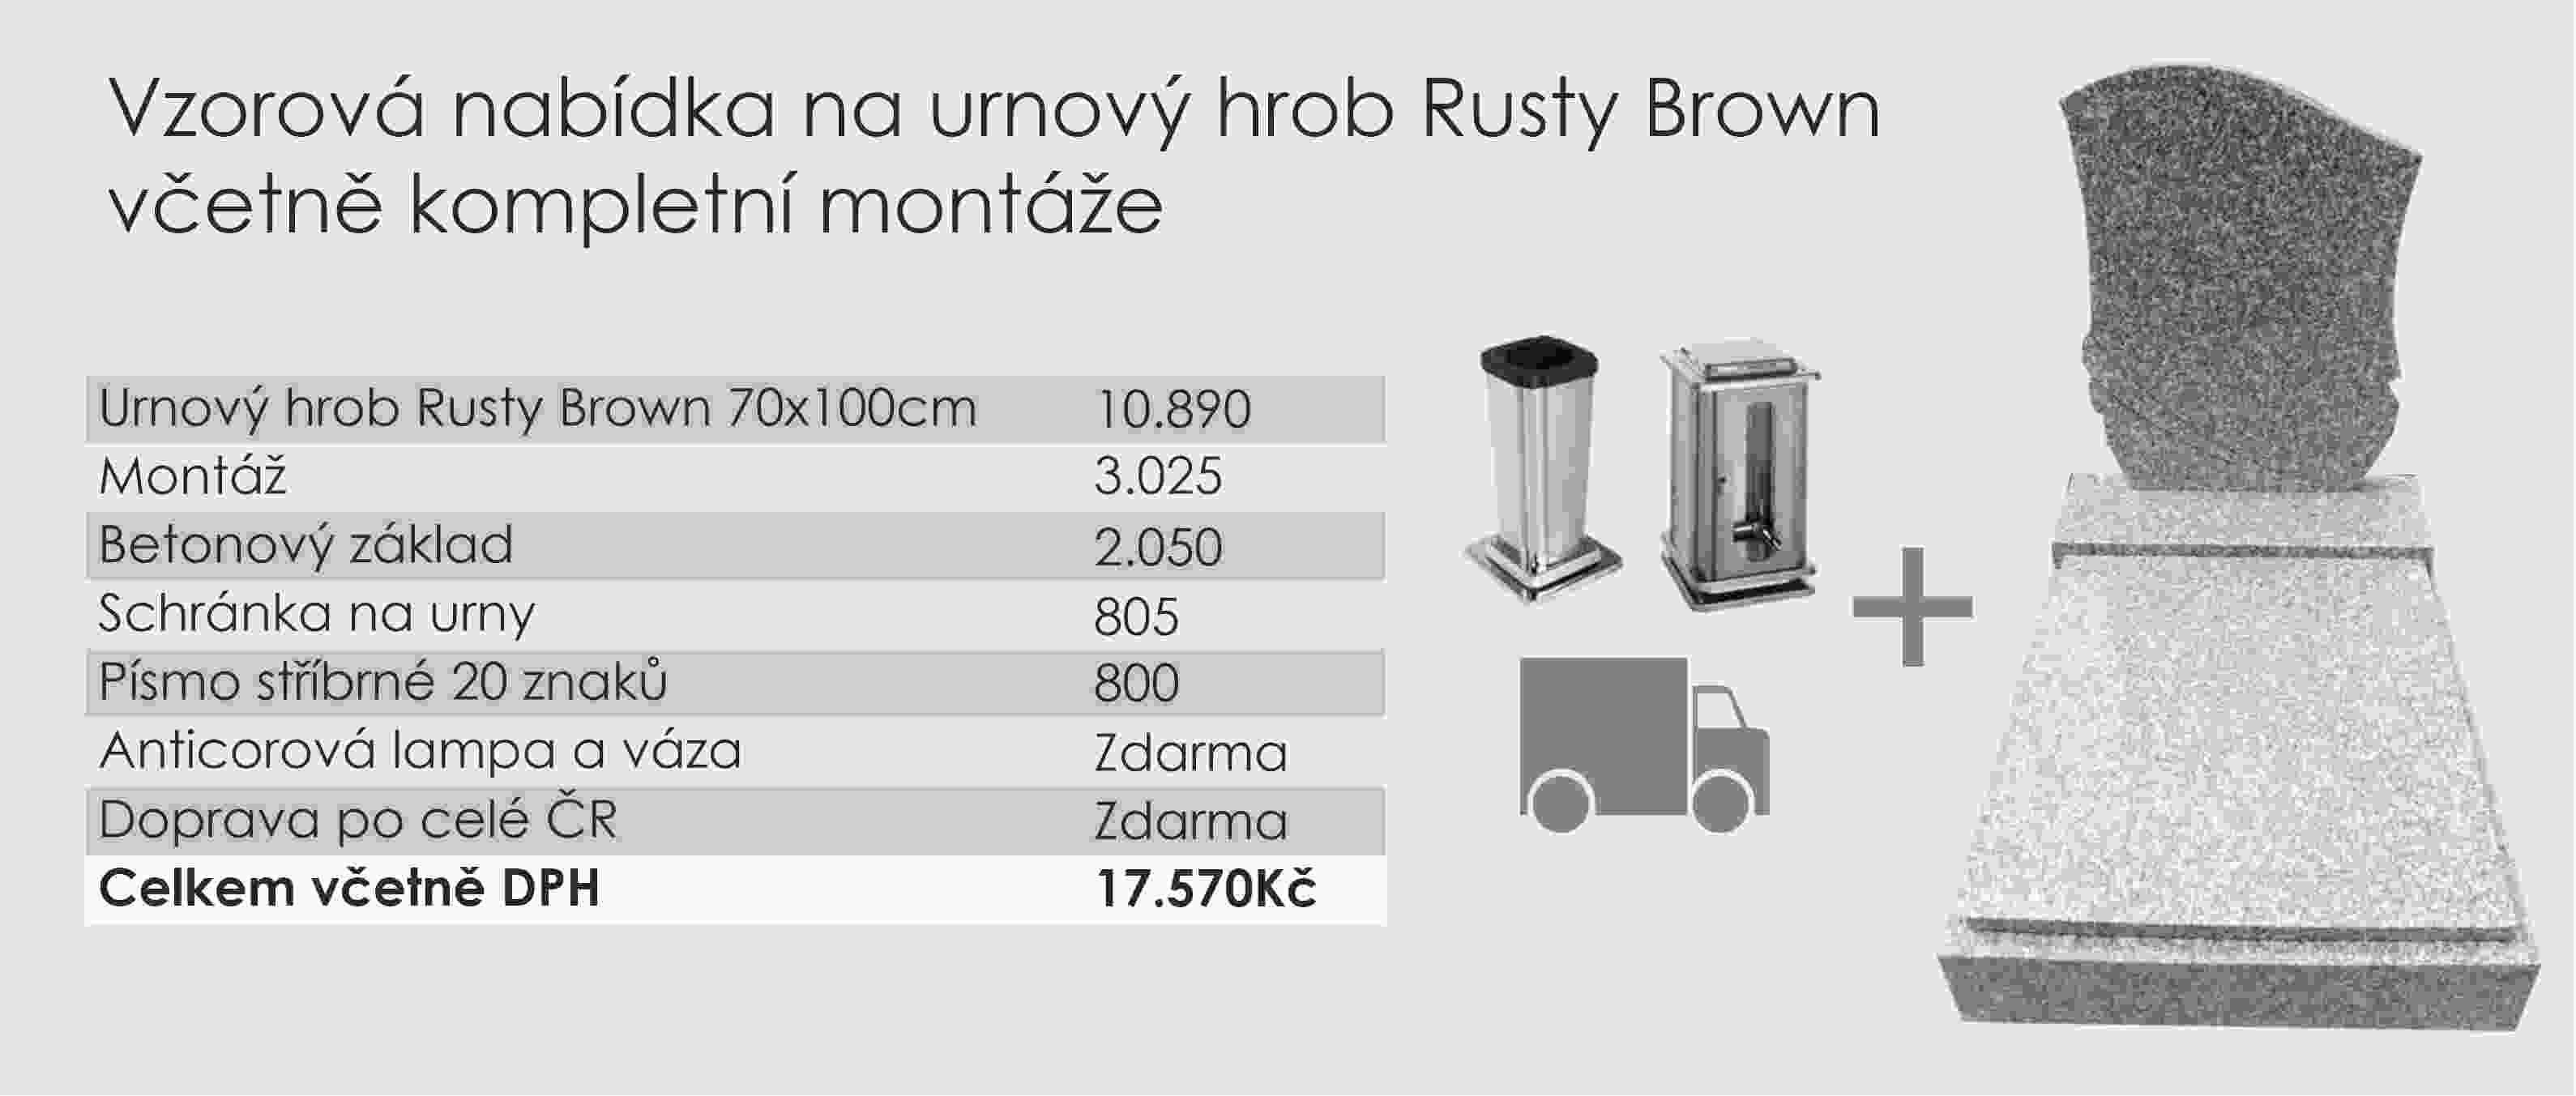 Vzorová nabídka Rusty Brown